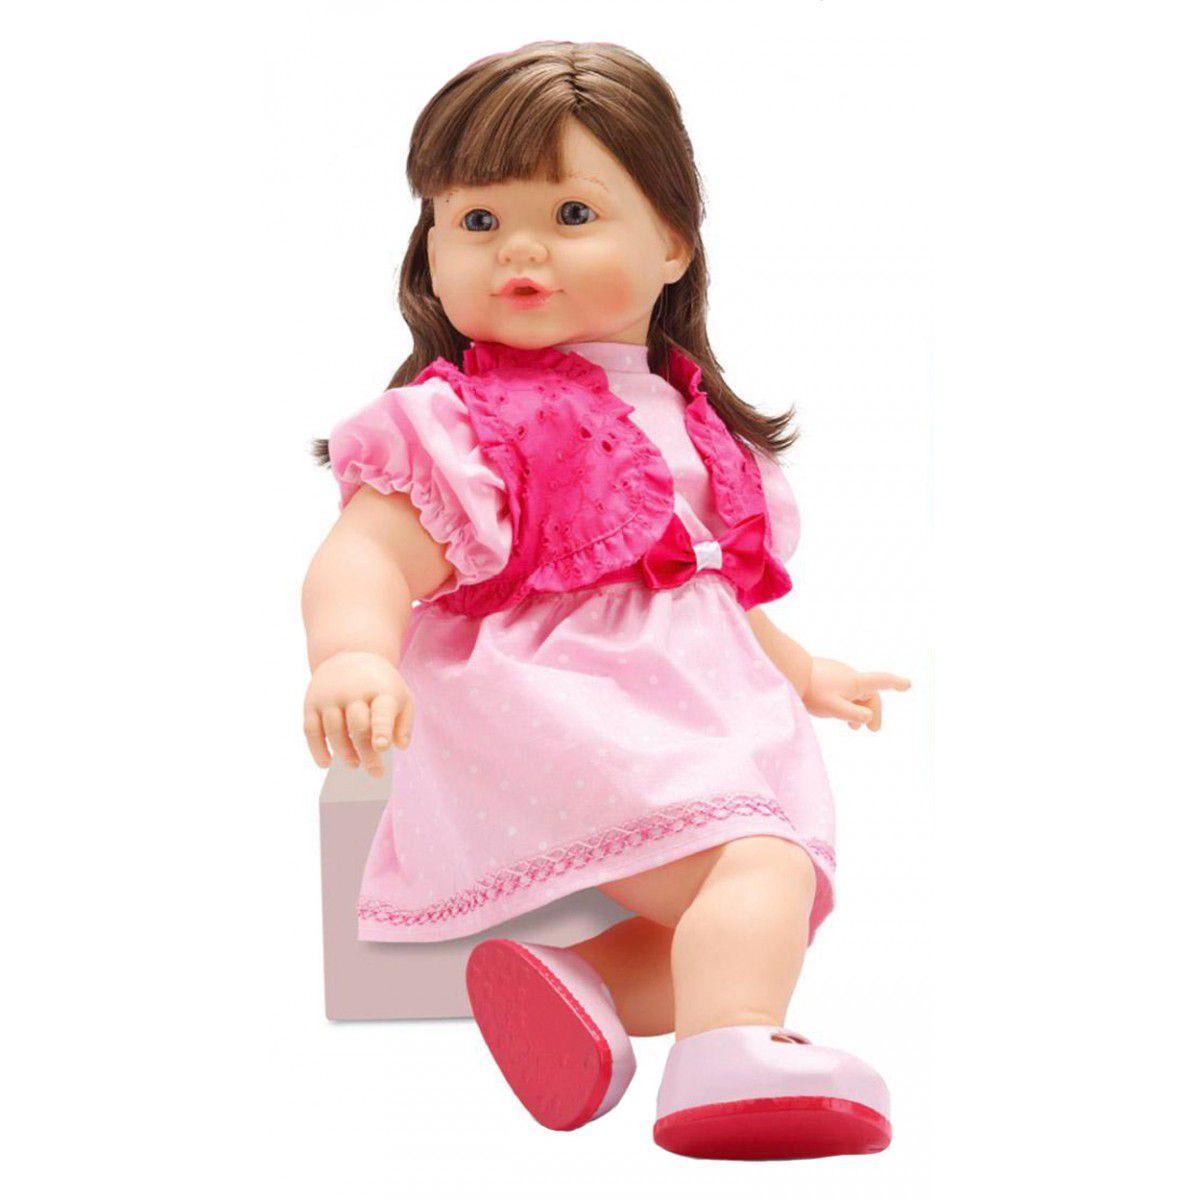 Boneca Smart Doll - Diver Toys